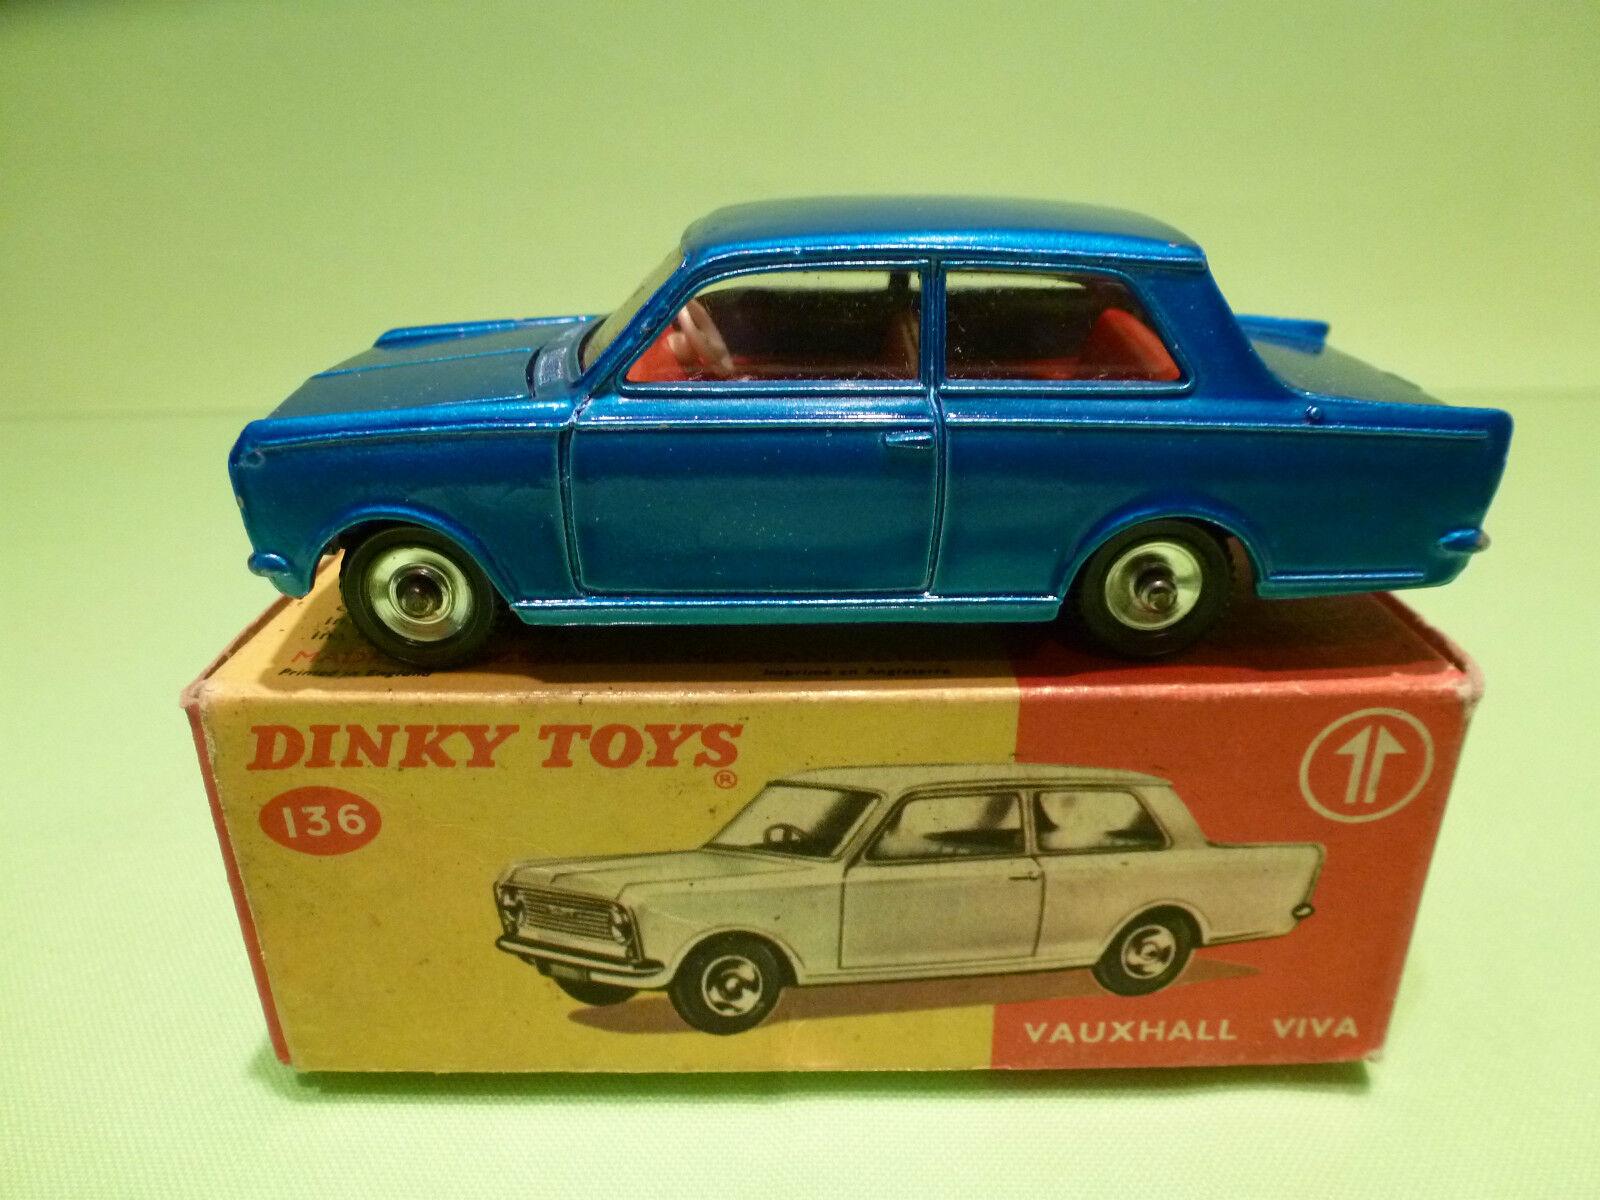 Opel - vauxhall viva dinky spielzeug 136 136 136 regulieren - blau 1 43 - selten selten ( 5 - vg im kasten 7c516c